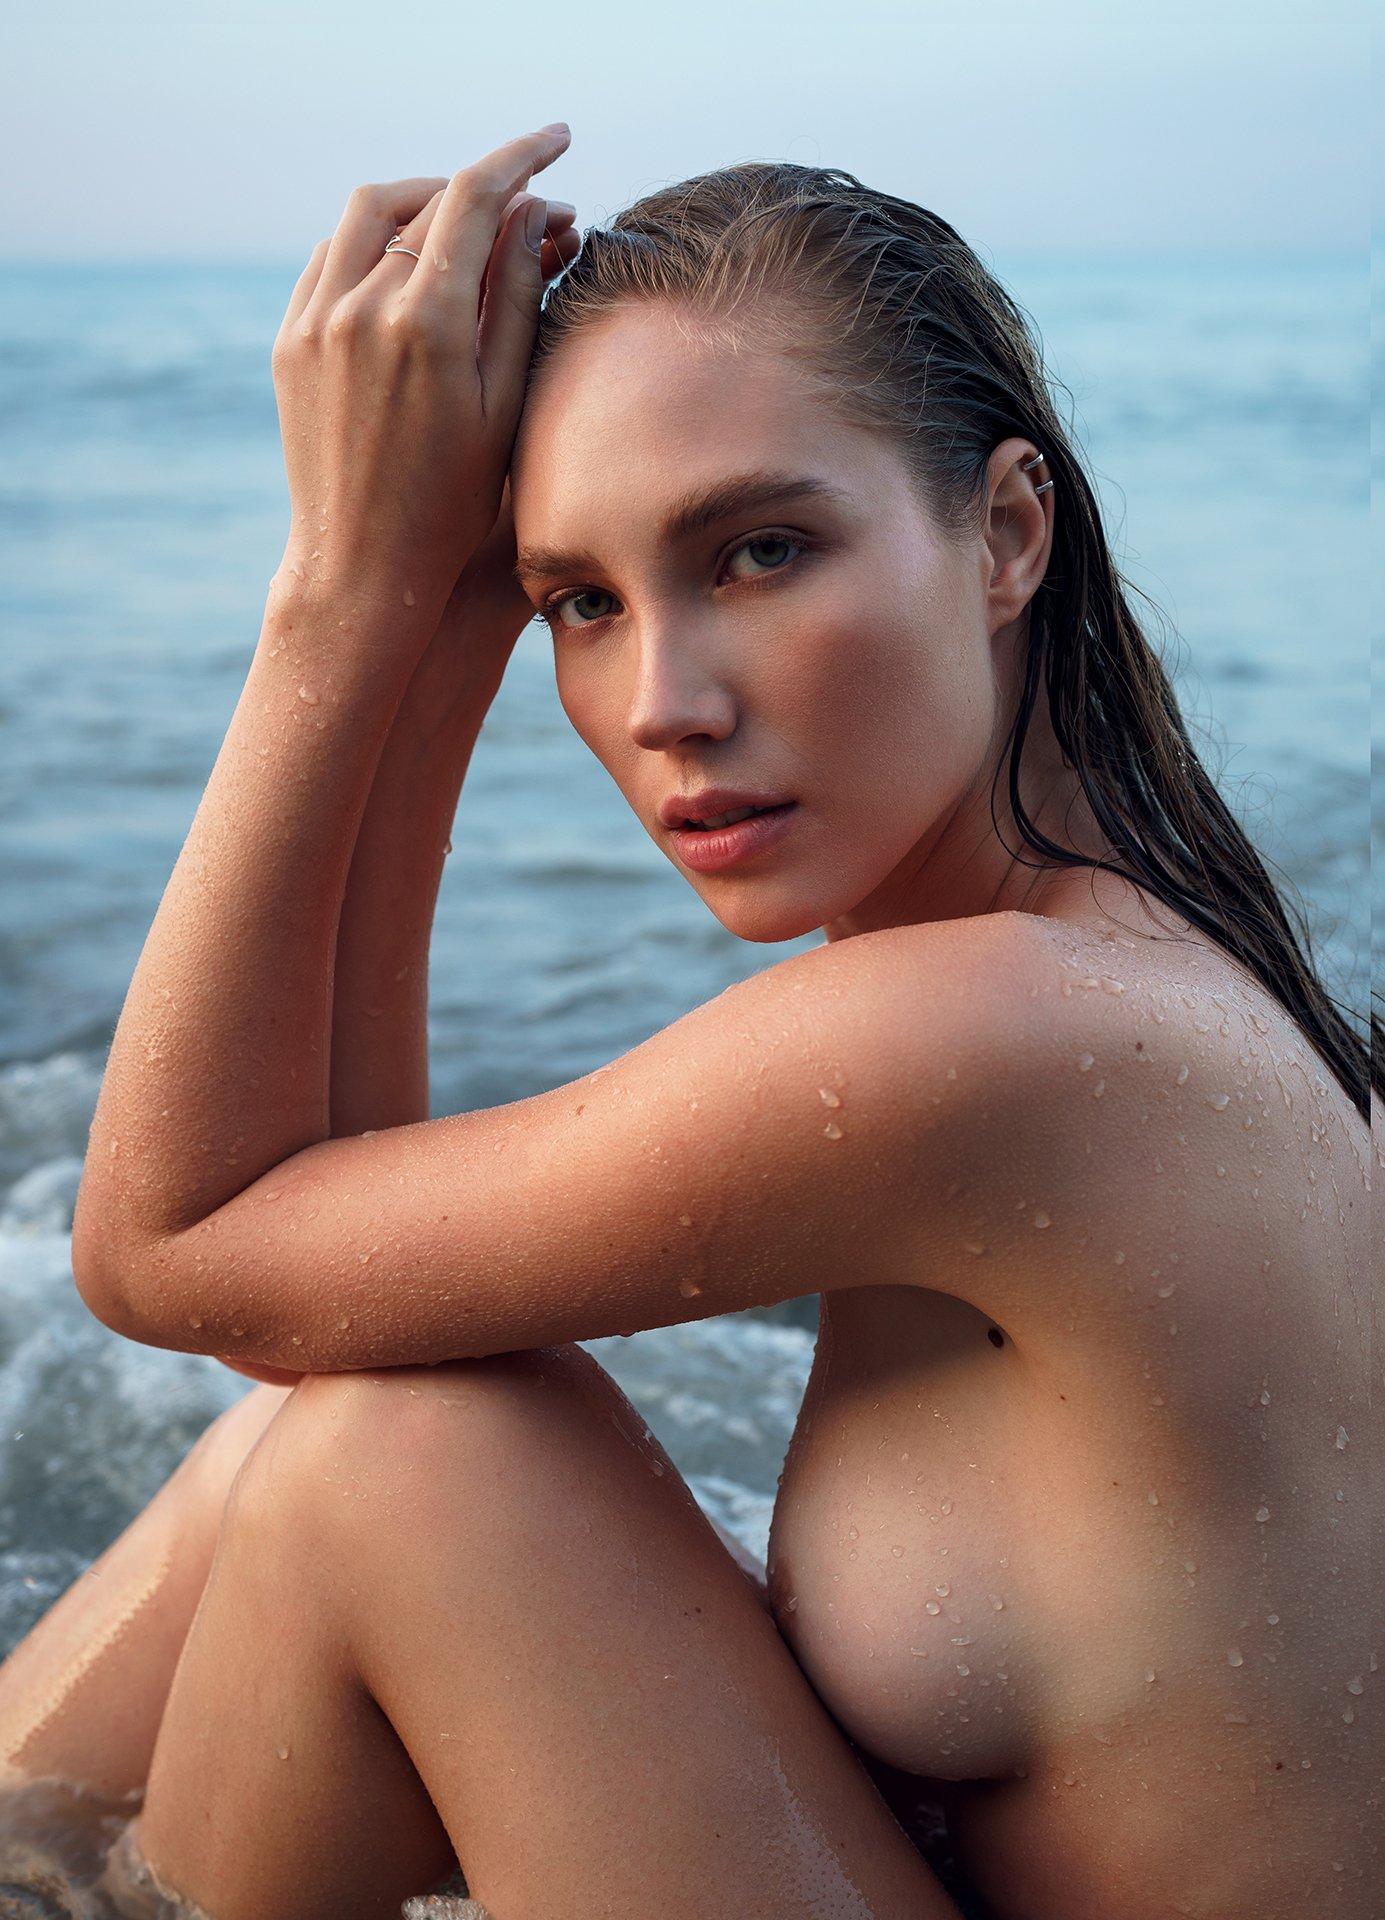 girl, model, nude, naked, drop, sea, water, face, nice, beautiful, beauty, body, dawn, natural light, Black Sea, novorossiysk, Роман Филиппов